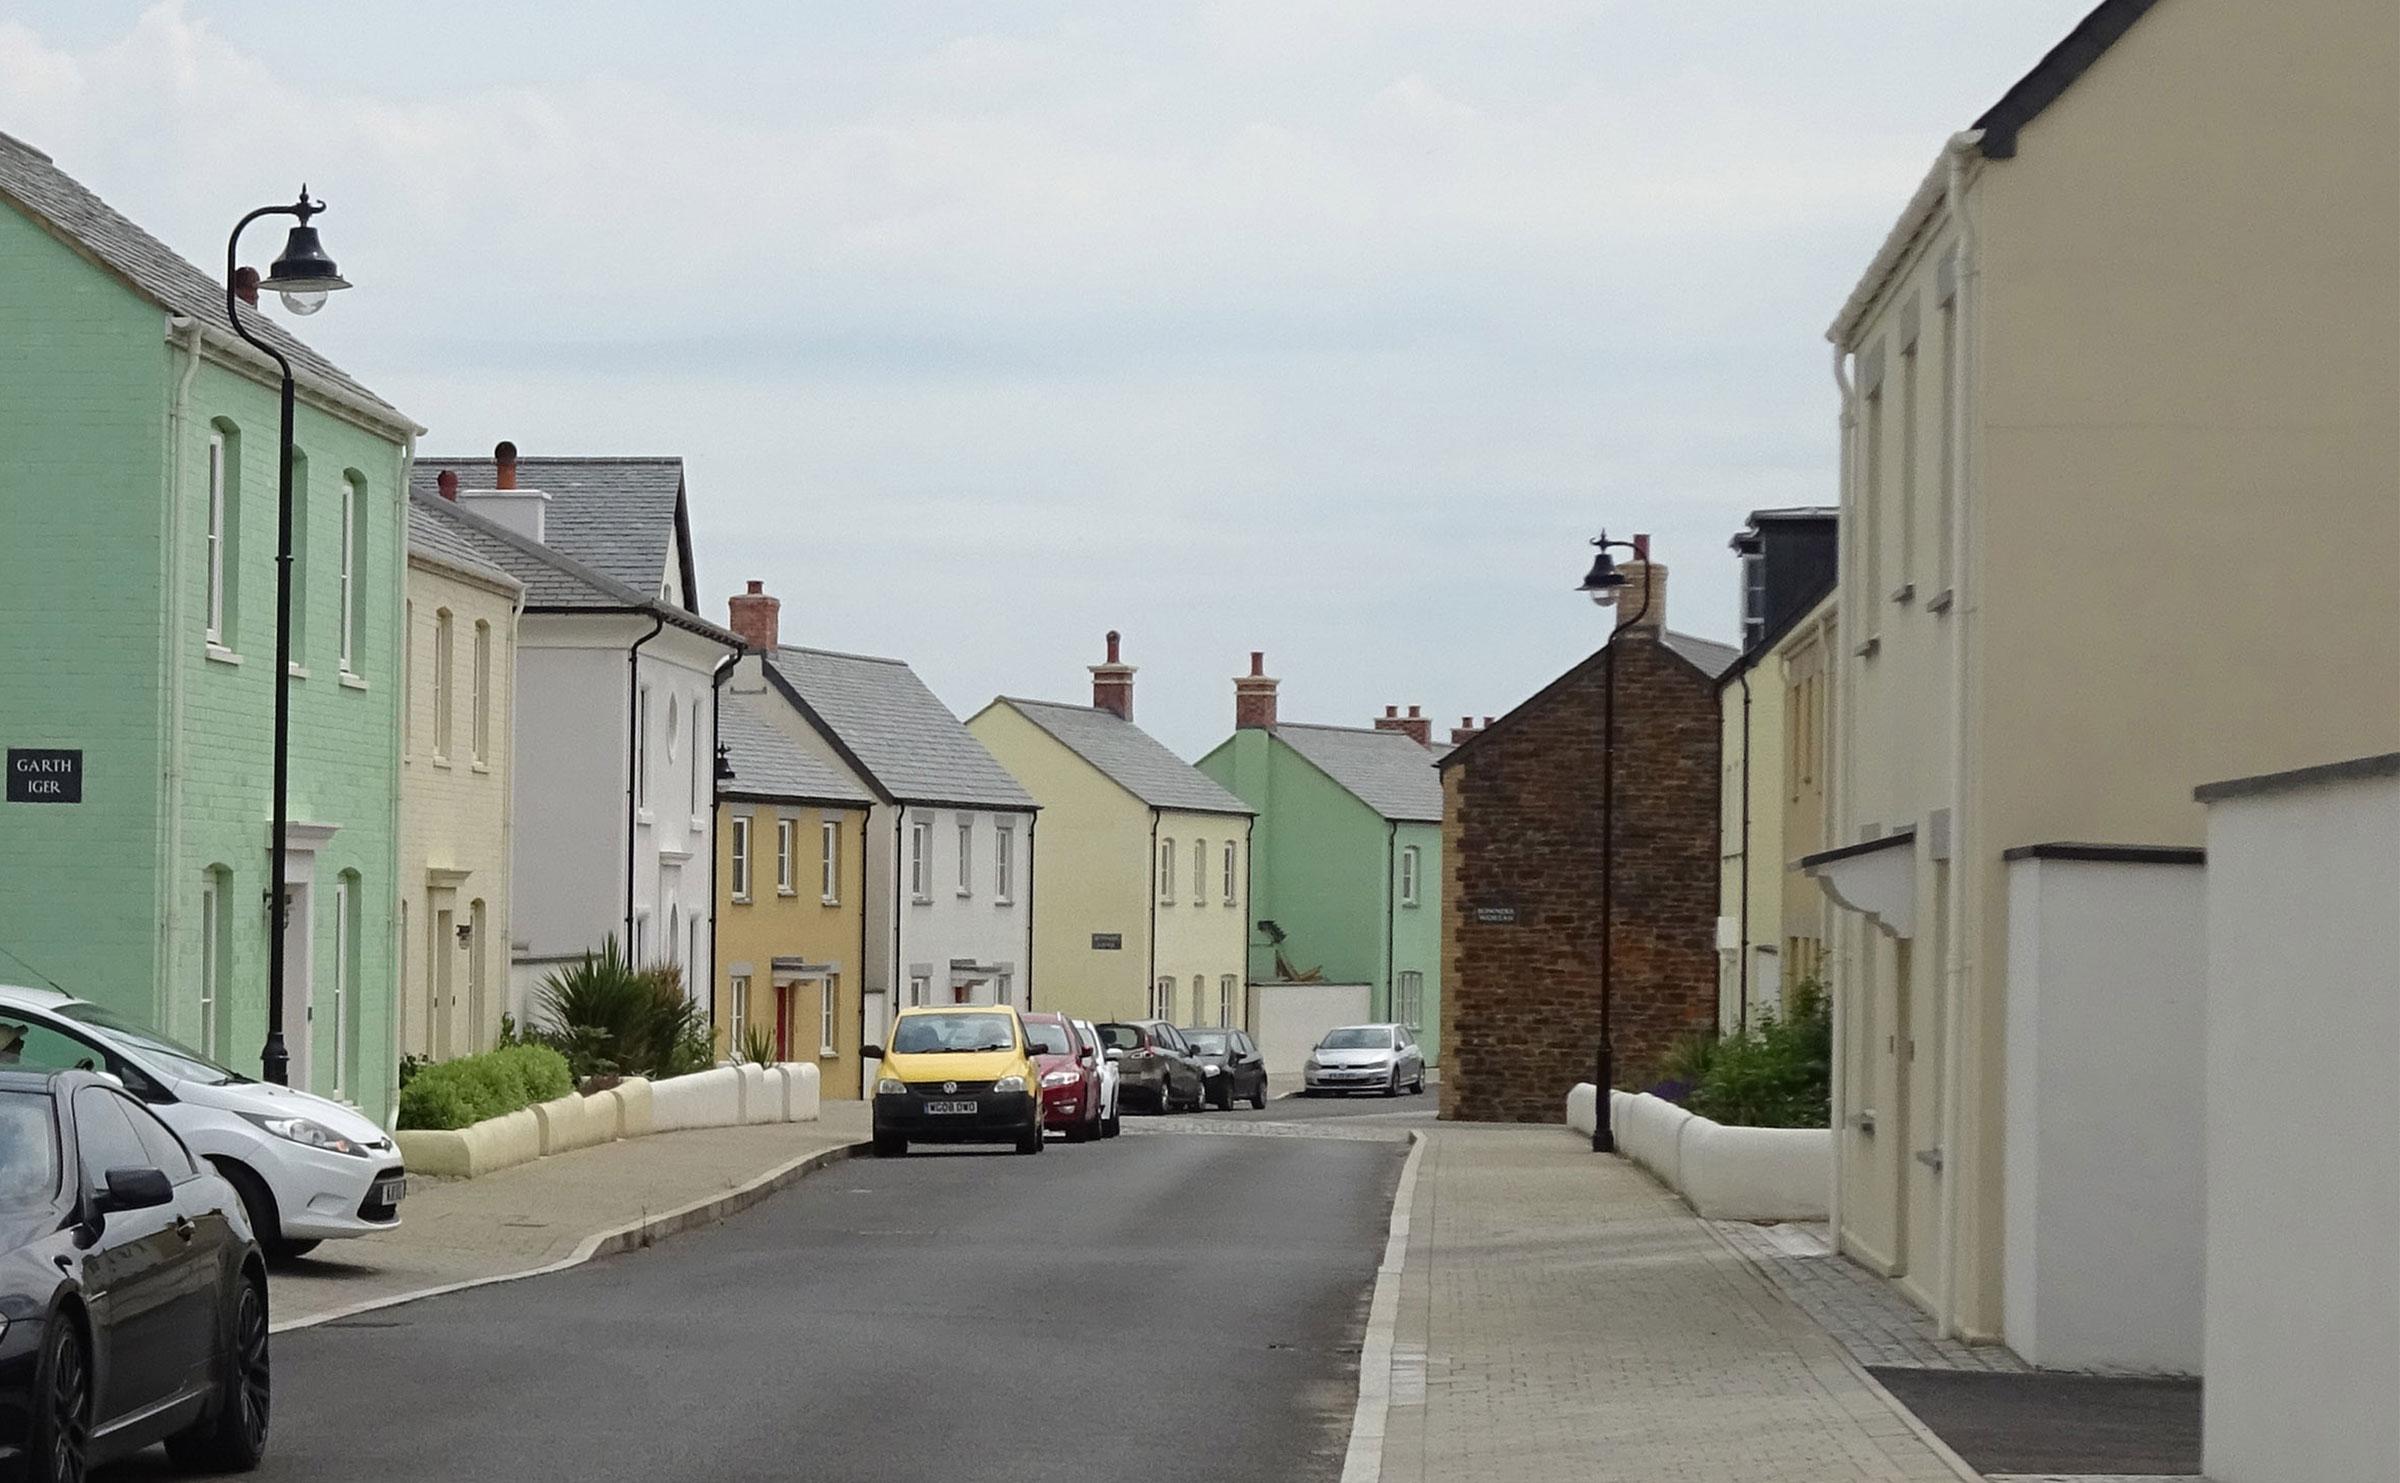 Nansledan near Newquay, Cornwall